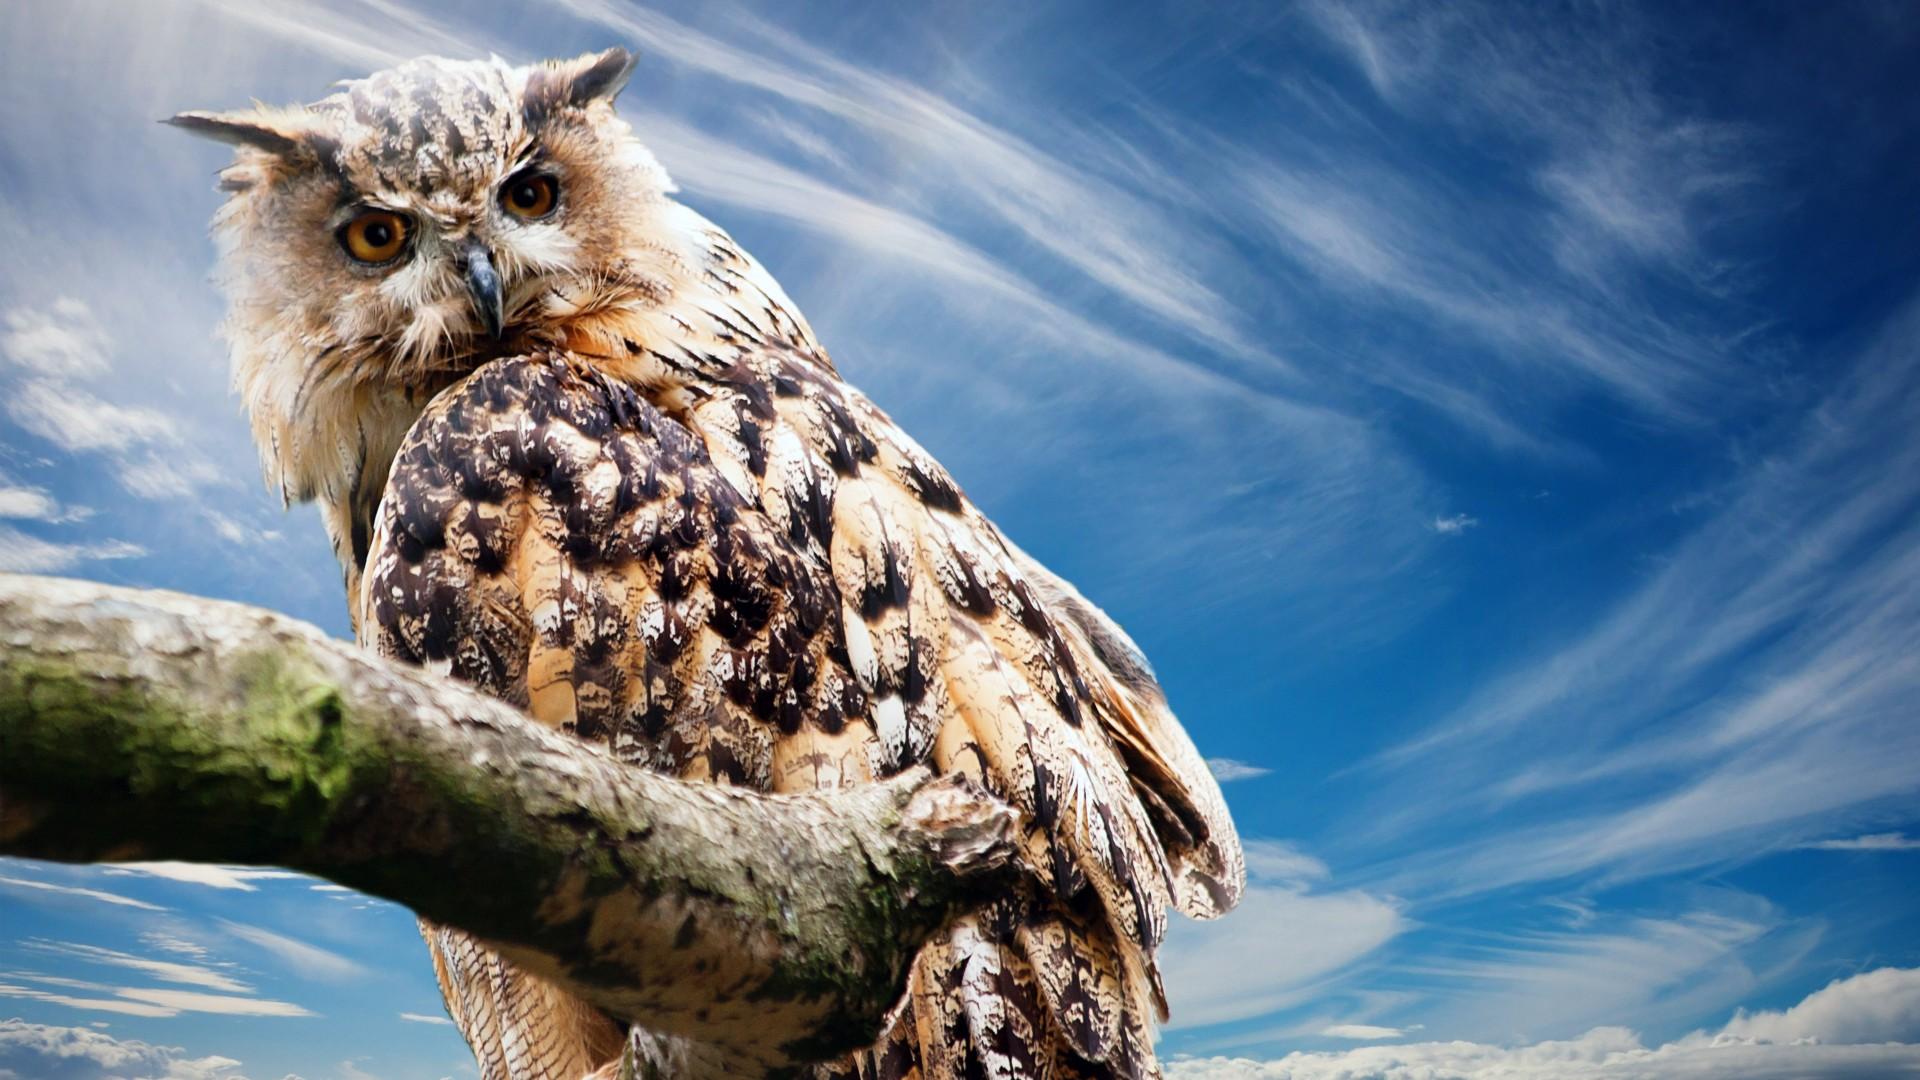 Cute Cheetah Wallpapers Owl Wallpapers Hd Wallpapers Id 16601